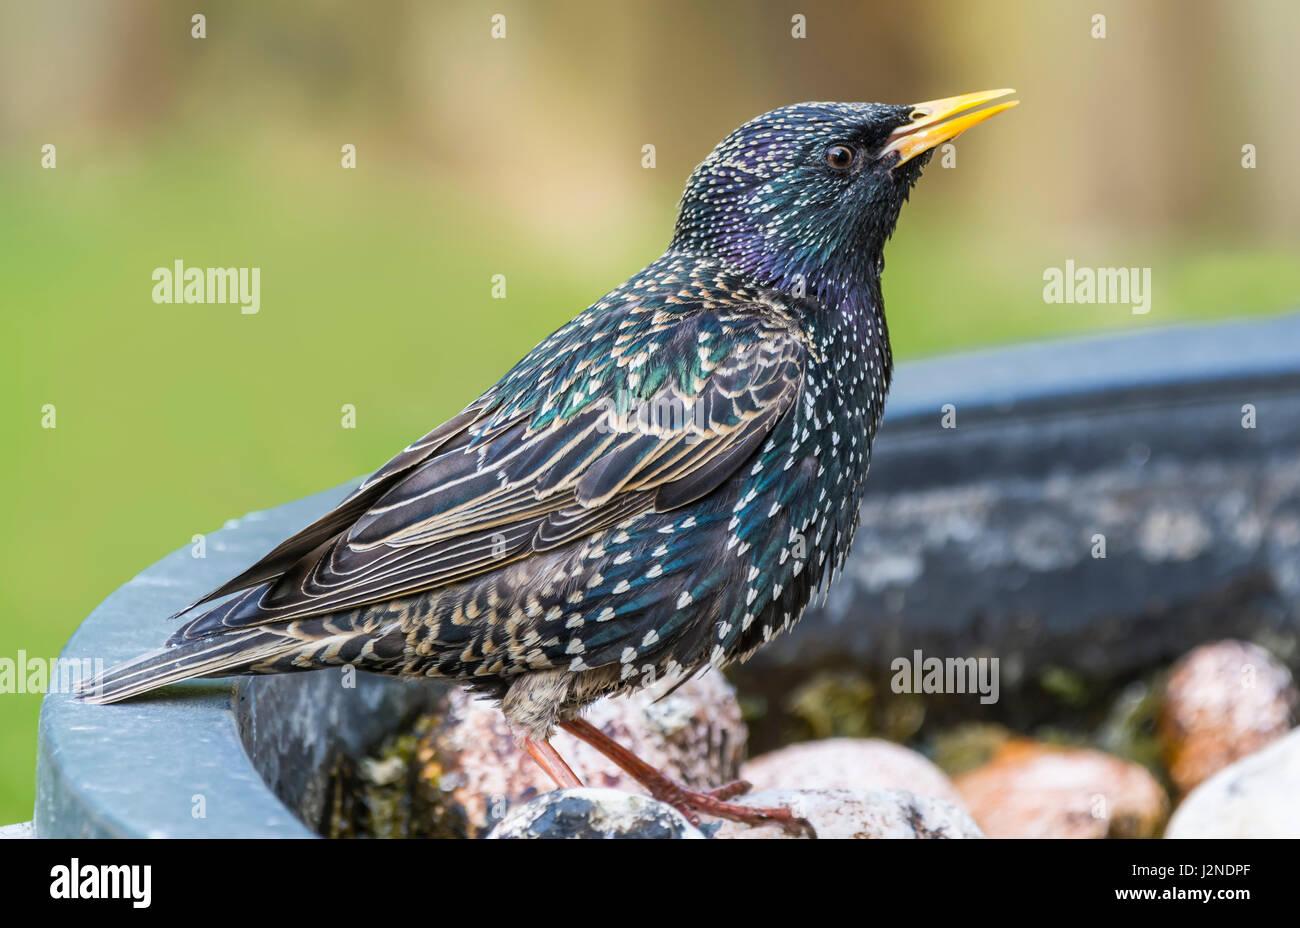 Adult female Common Starling (Sturnus vulgaris) bird in Summer plumage in Spring in West Sussex, England, UK. Stock Photo